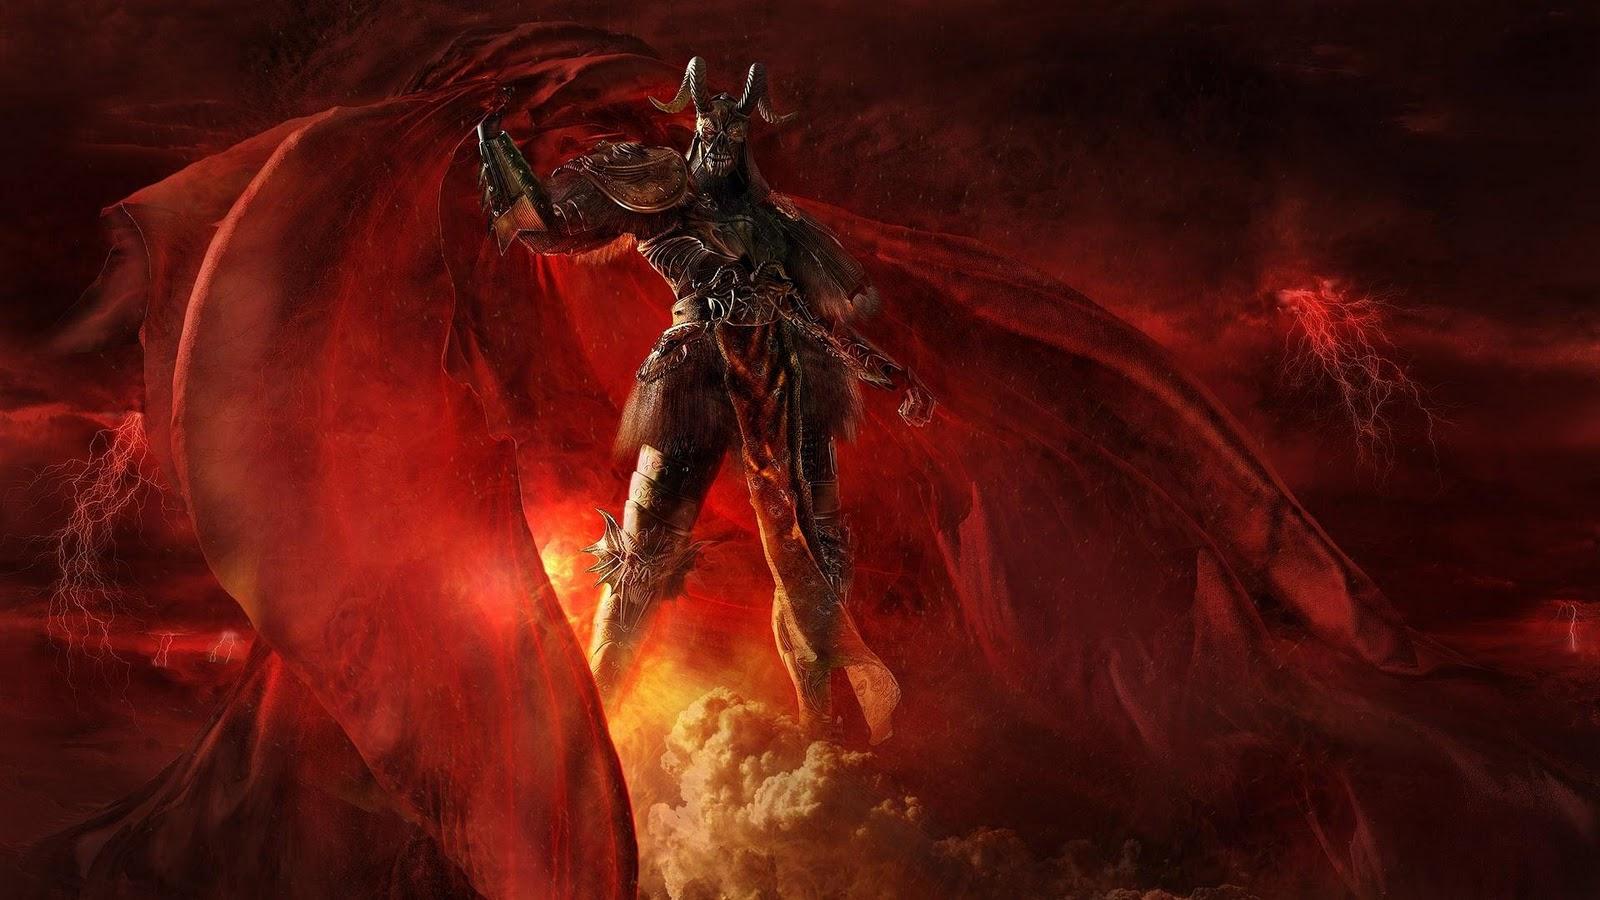 devil demon wallpaper - photo #6